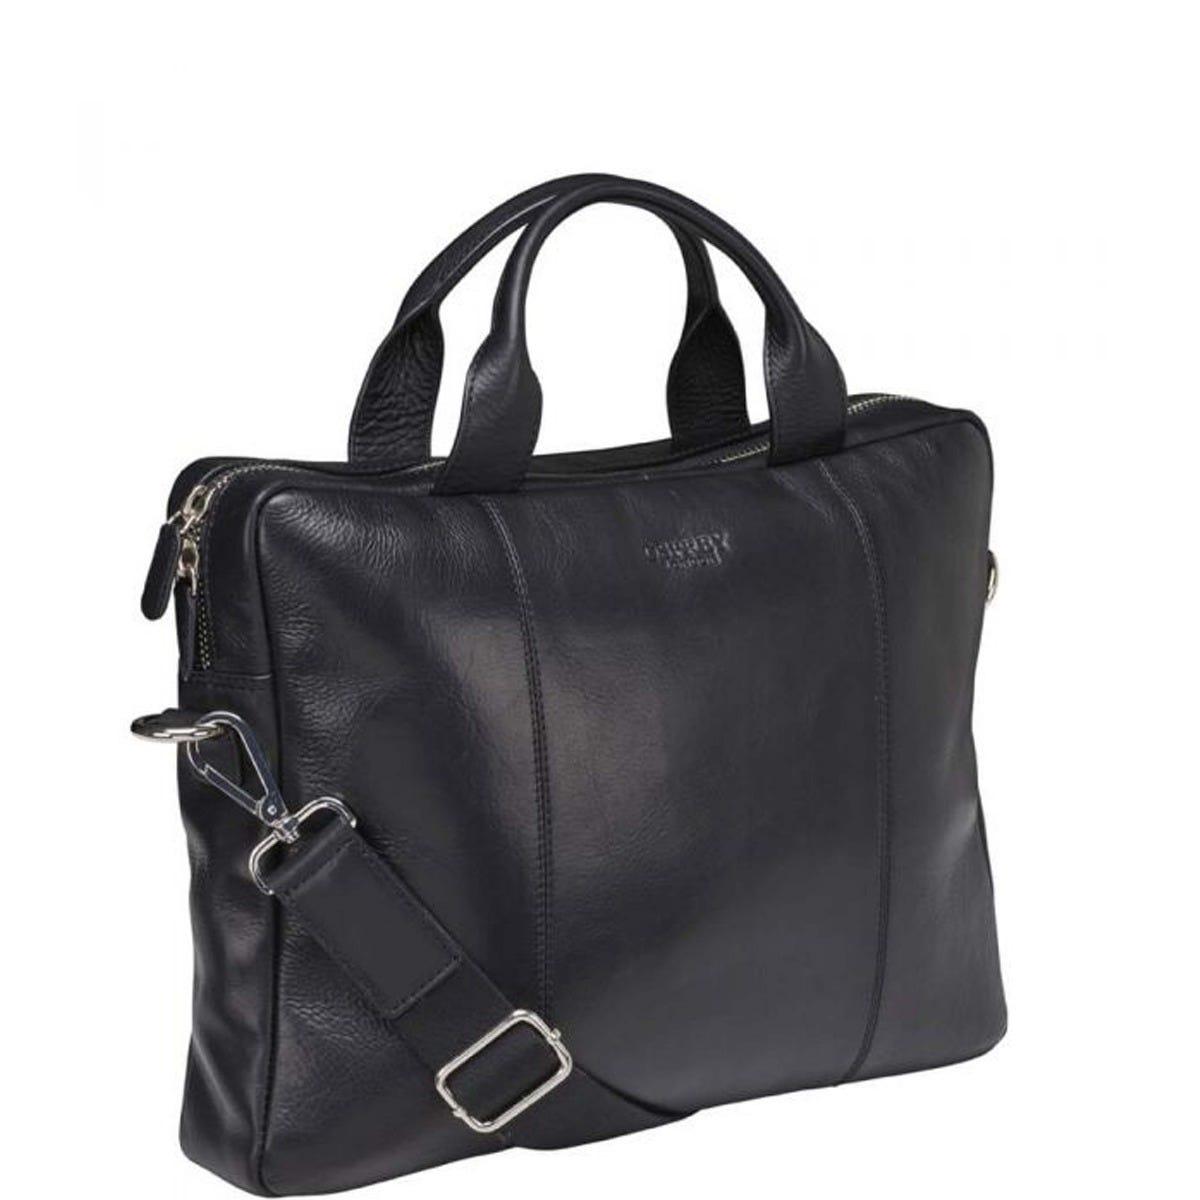 42a4585727 Mens Leather Overnight Bags Australia- Fenix Toulouse Handball